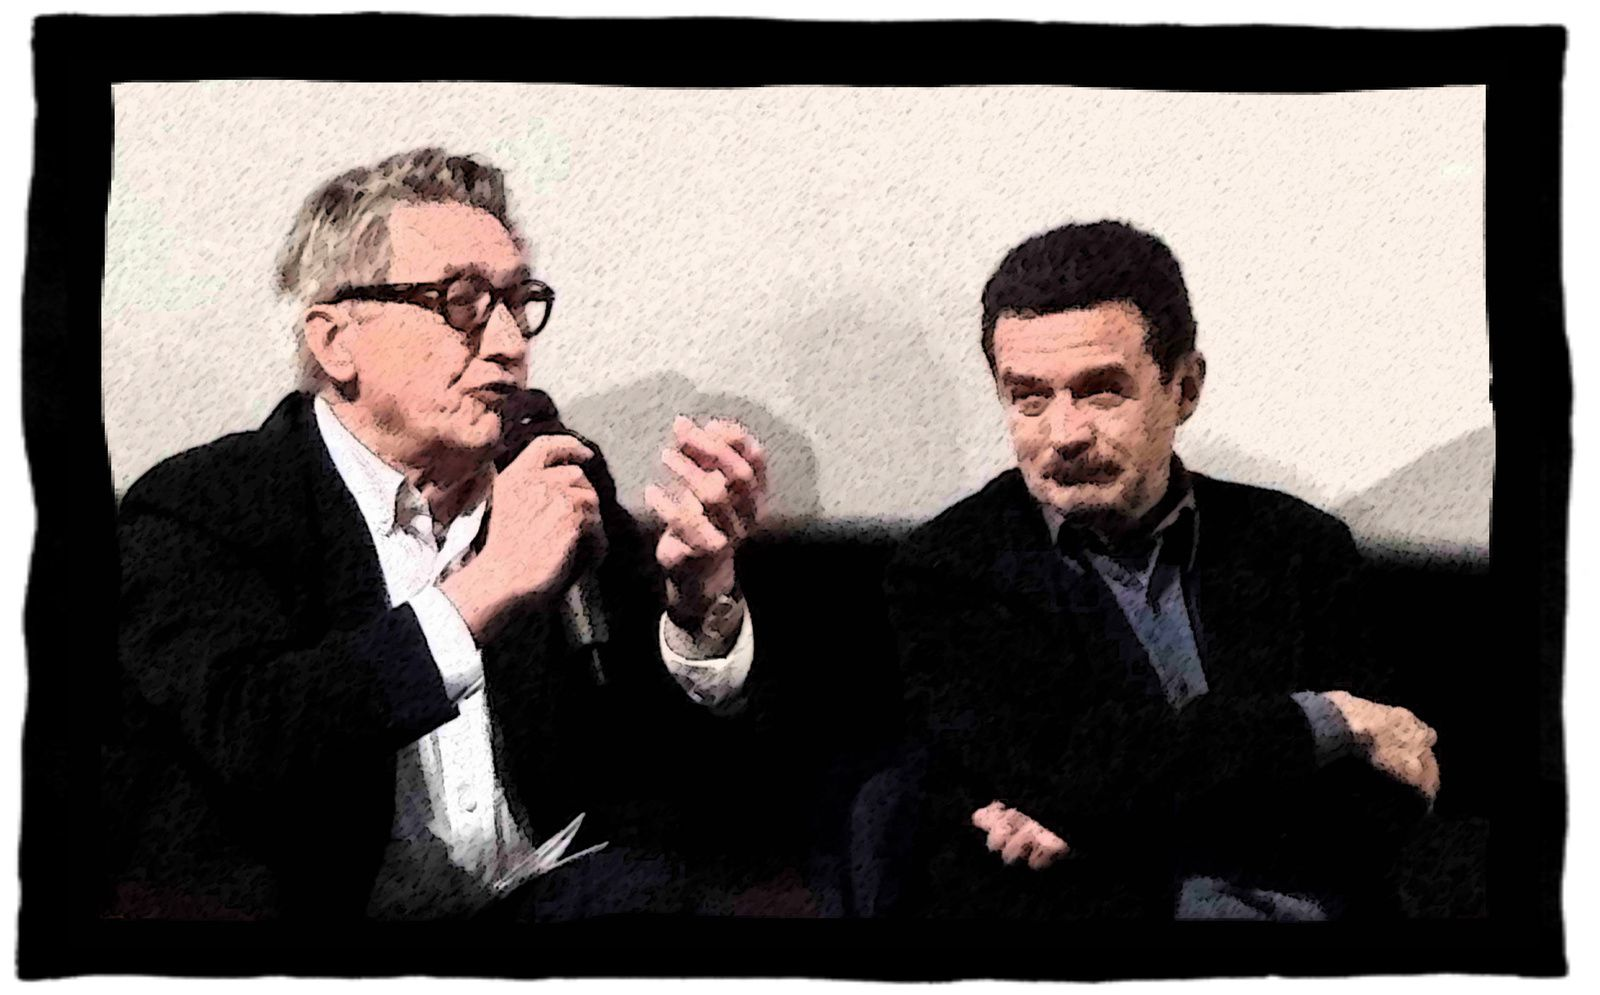 Edwy Plenel, Maurice Ulrich, 1er mai 2015. Photo : Virginie, le Chêne parlant & Cie.